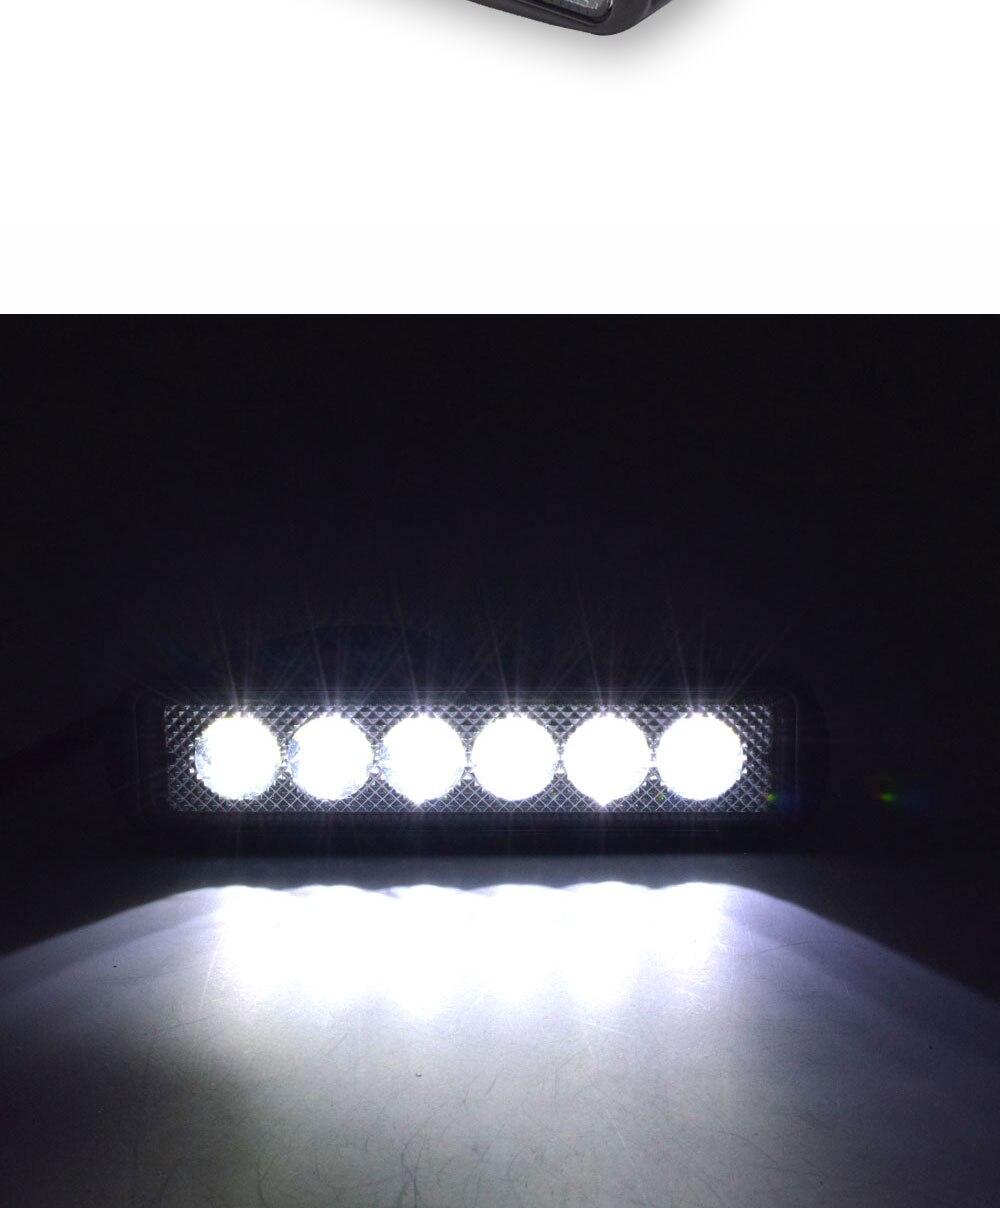 12V 24V Auto LED Light 18W Car Work Lamp Boat Vehicle Top Head Bulb 2000LM IP67 Waterproof Flood Beam Lighting Spot Lights (7)